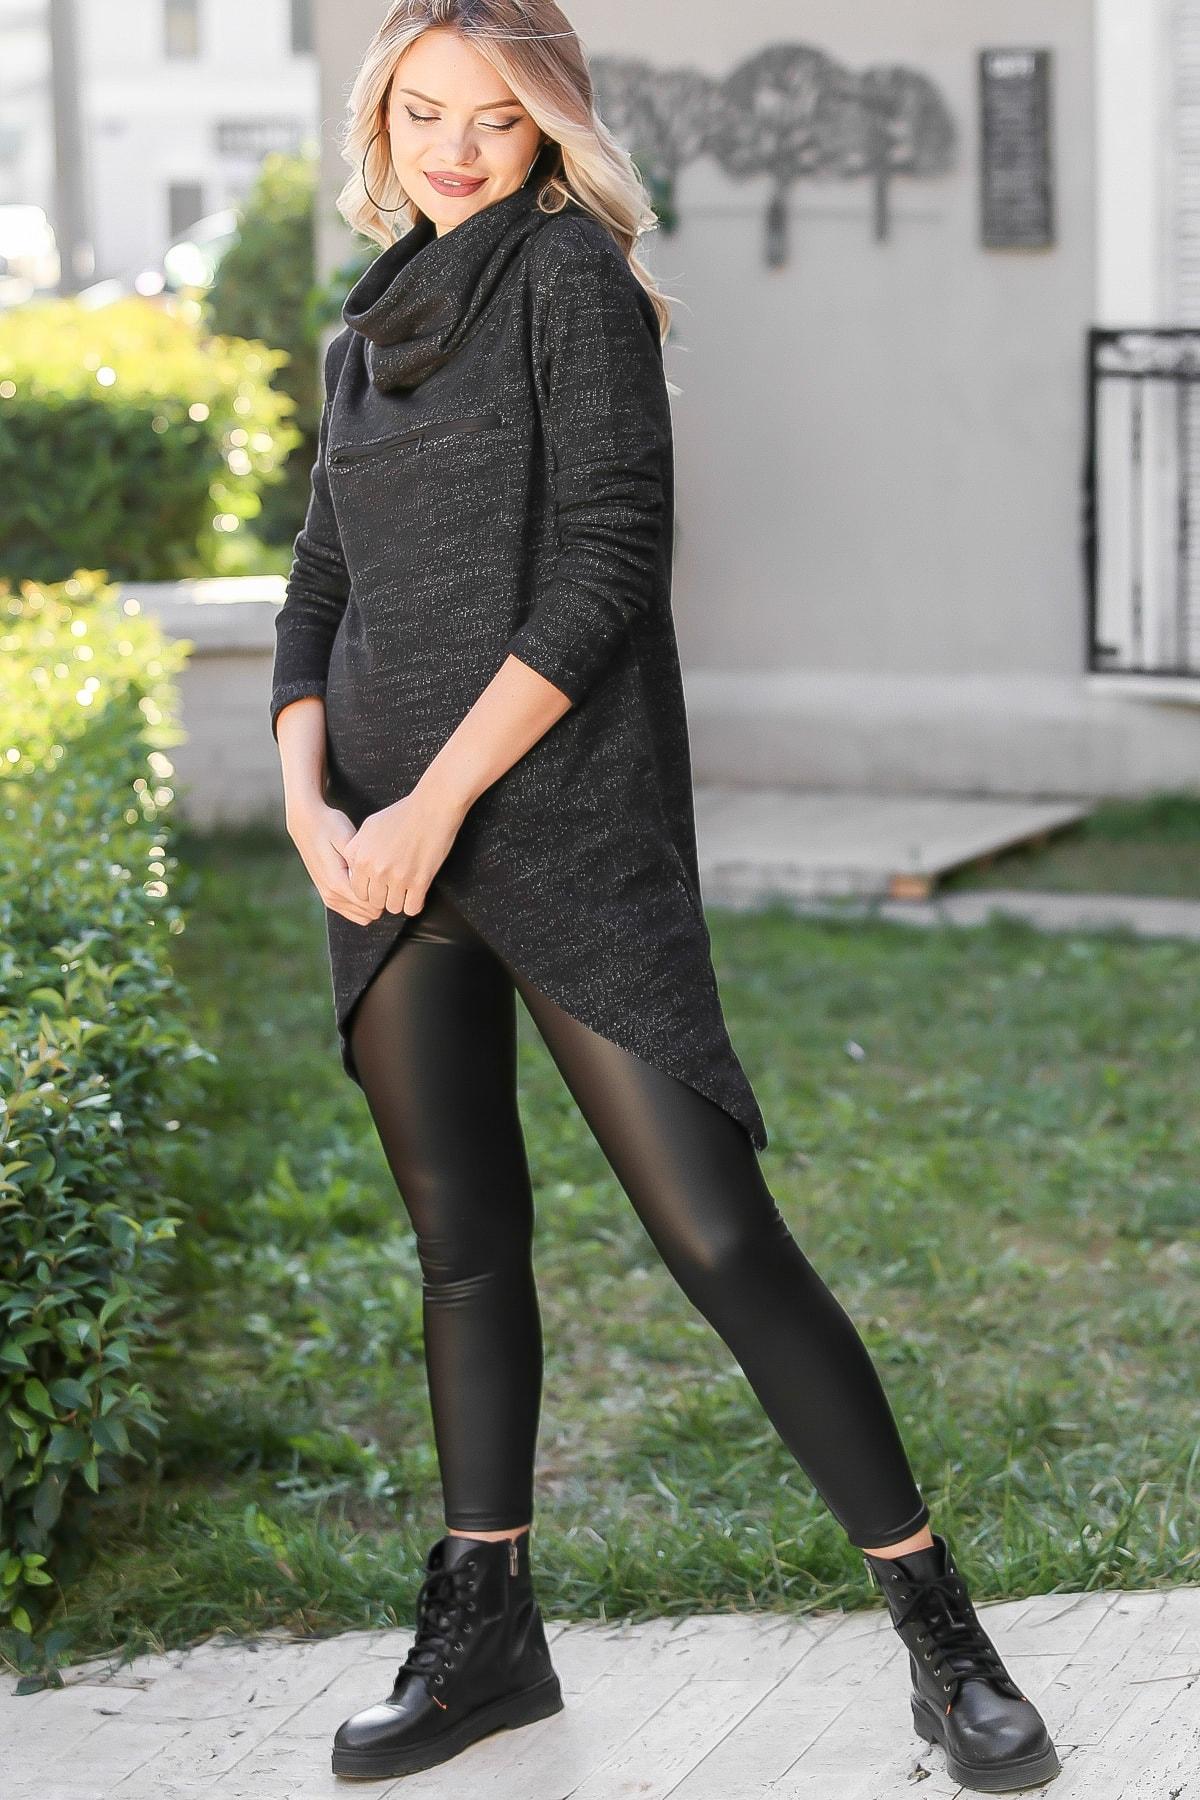 Chiccy Kadın Siyah Bohem Dev Boğazlı Anvelop Fermuarlı Dev Cep Detaylı Sweat M10010700SW99231 3